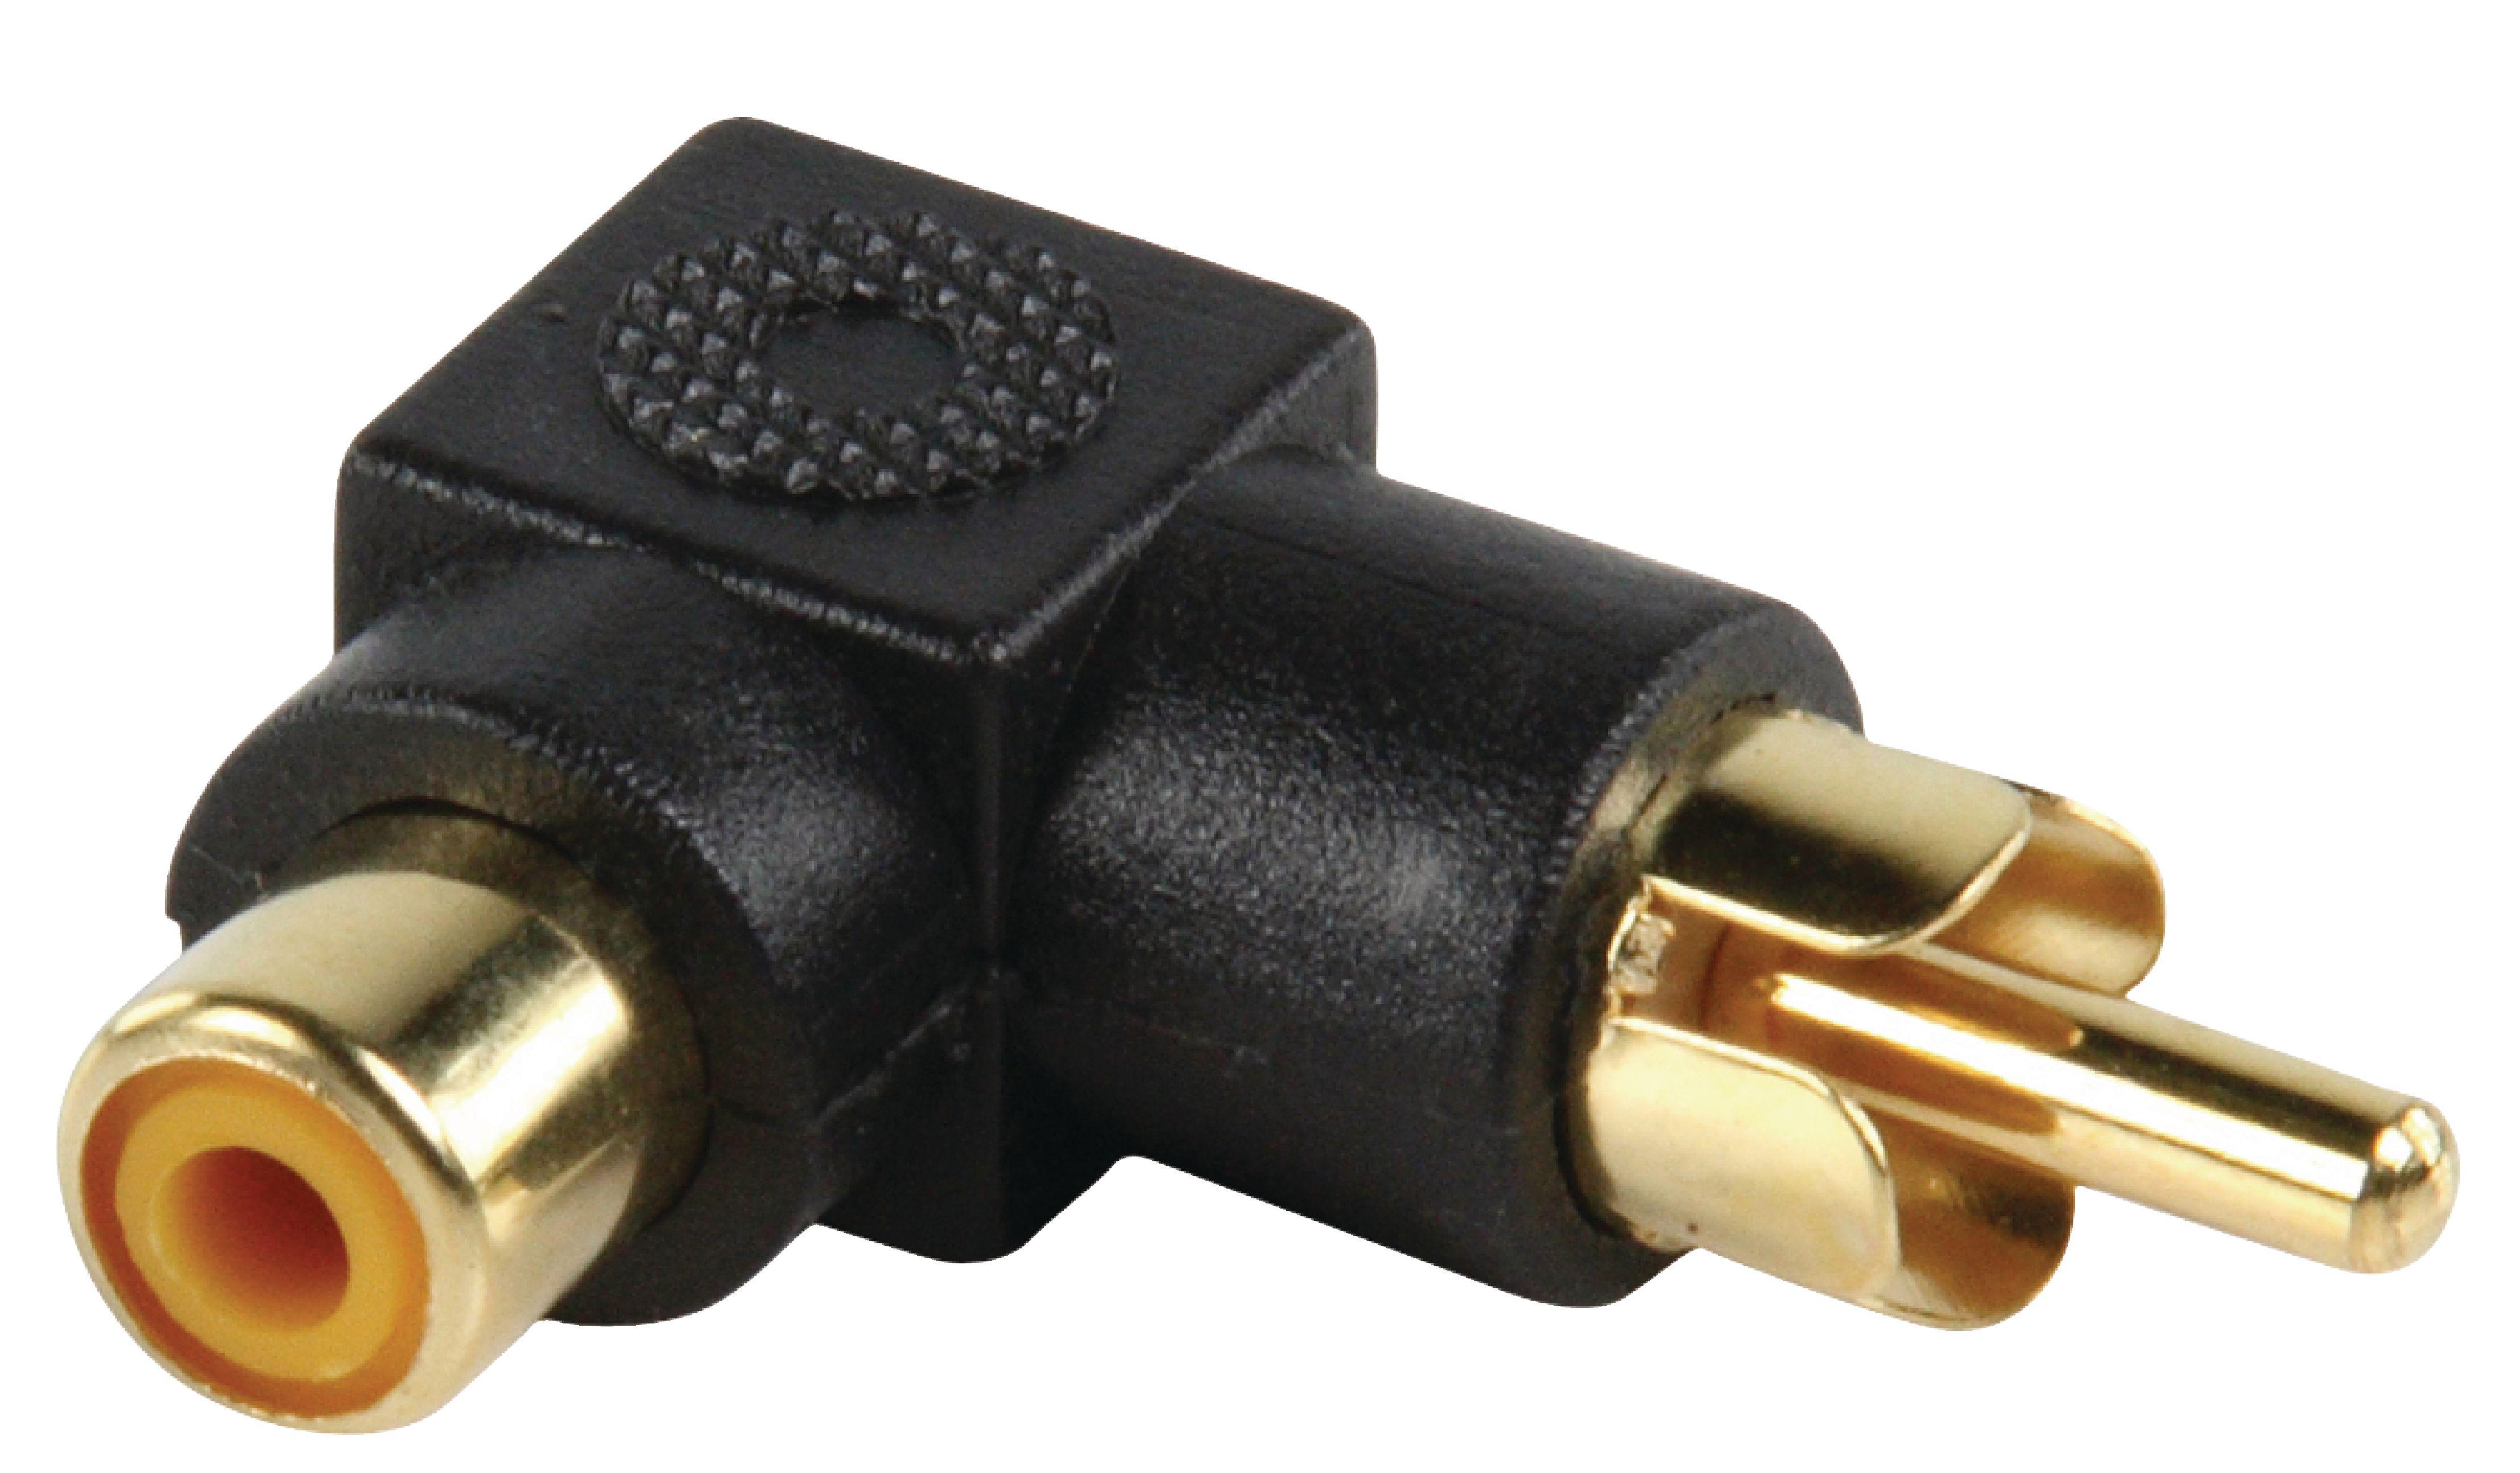 Valueline AC-054 Stereo Audio Adapter Angled 90° RCA Male - RCA Female